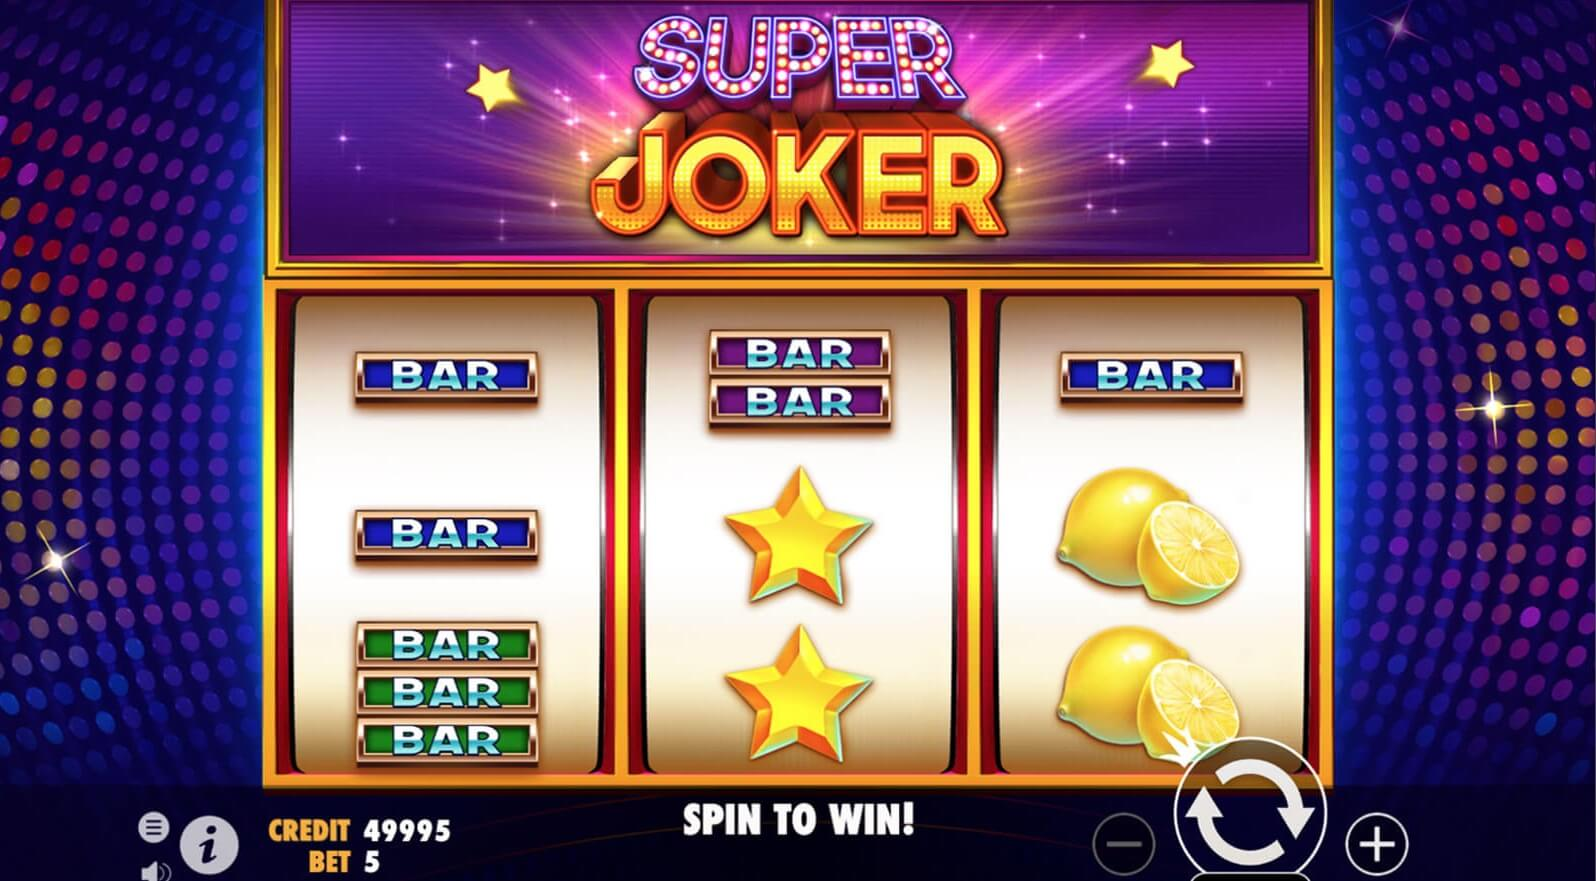 super joker slot screen